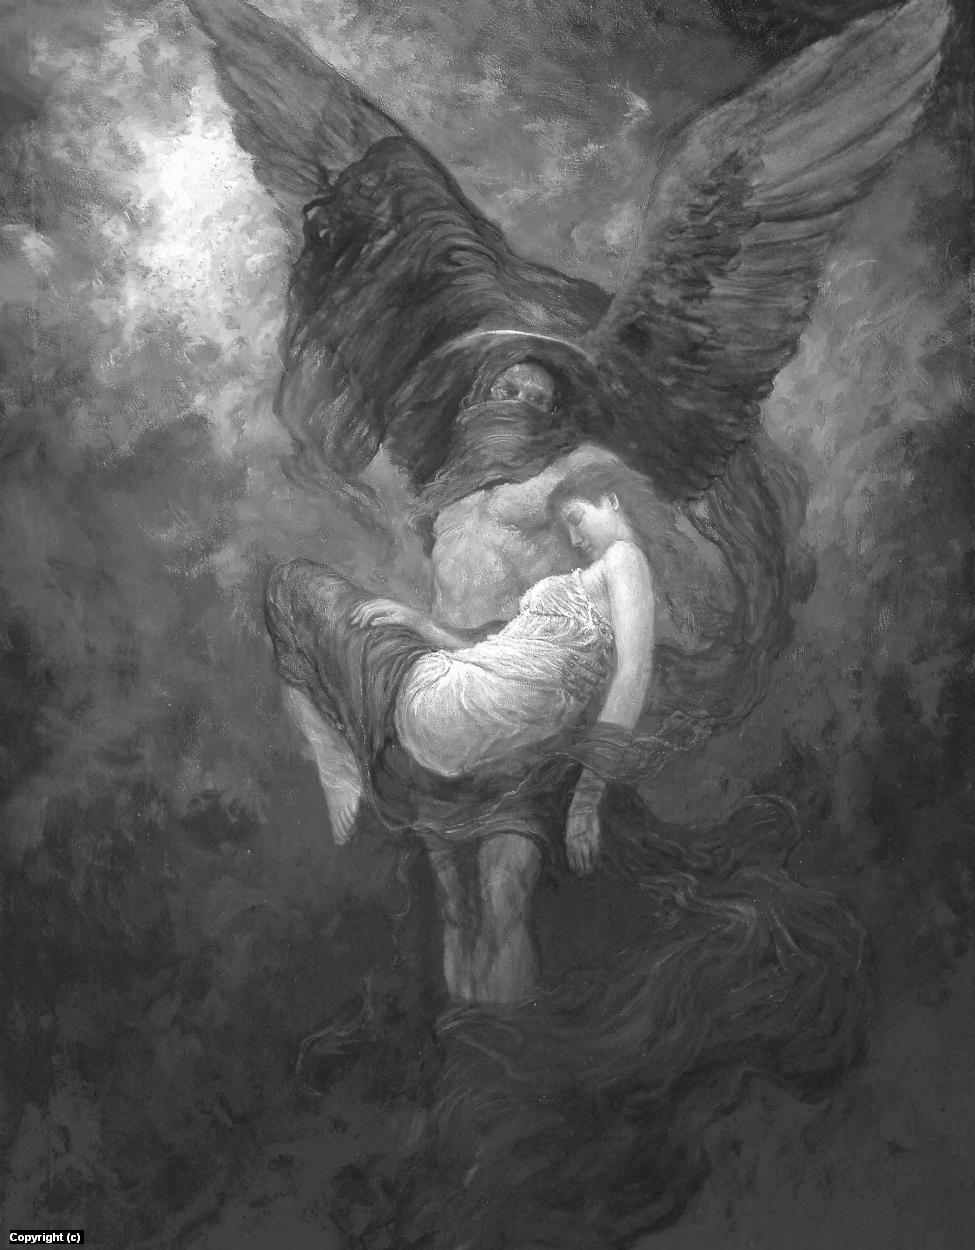 Gabriel's Lament Artwork by marc fishman